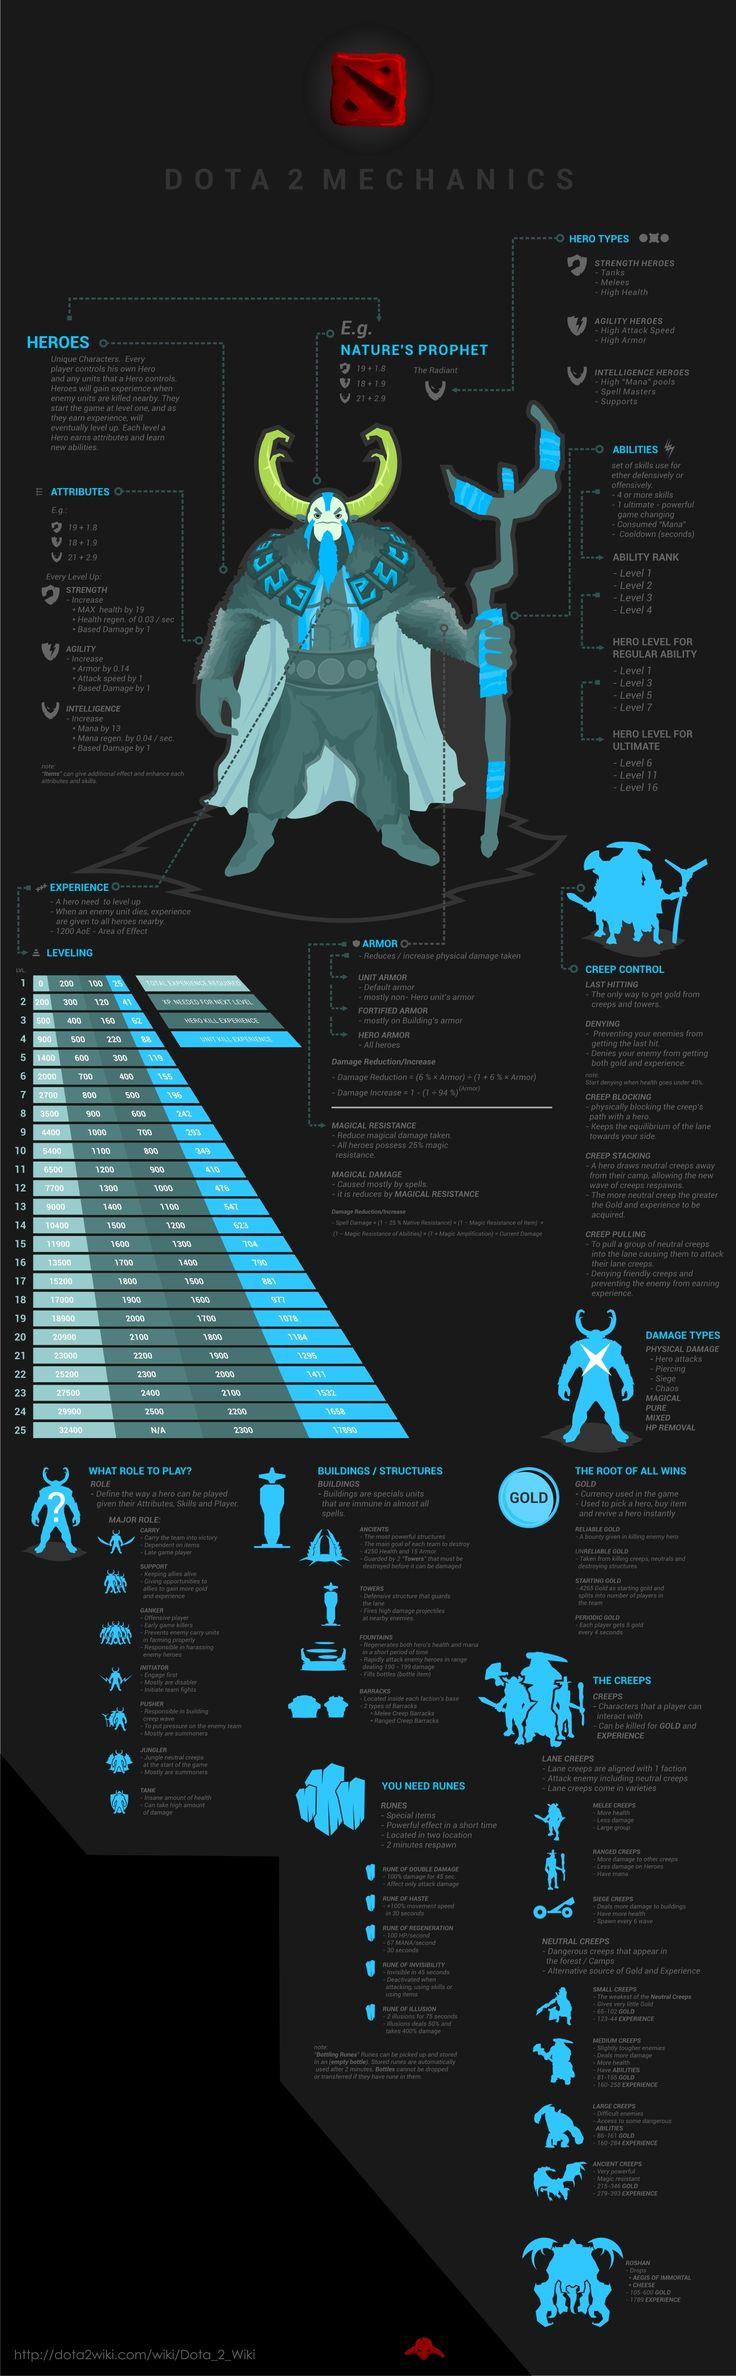 Dota 2 Mechanics http://infographiczone.com/infographics/dota-2-mechanics.jpg